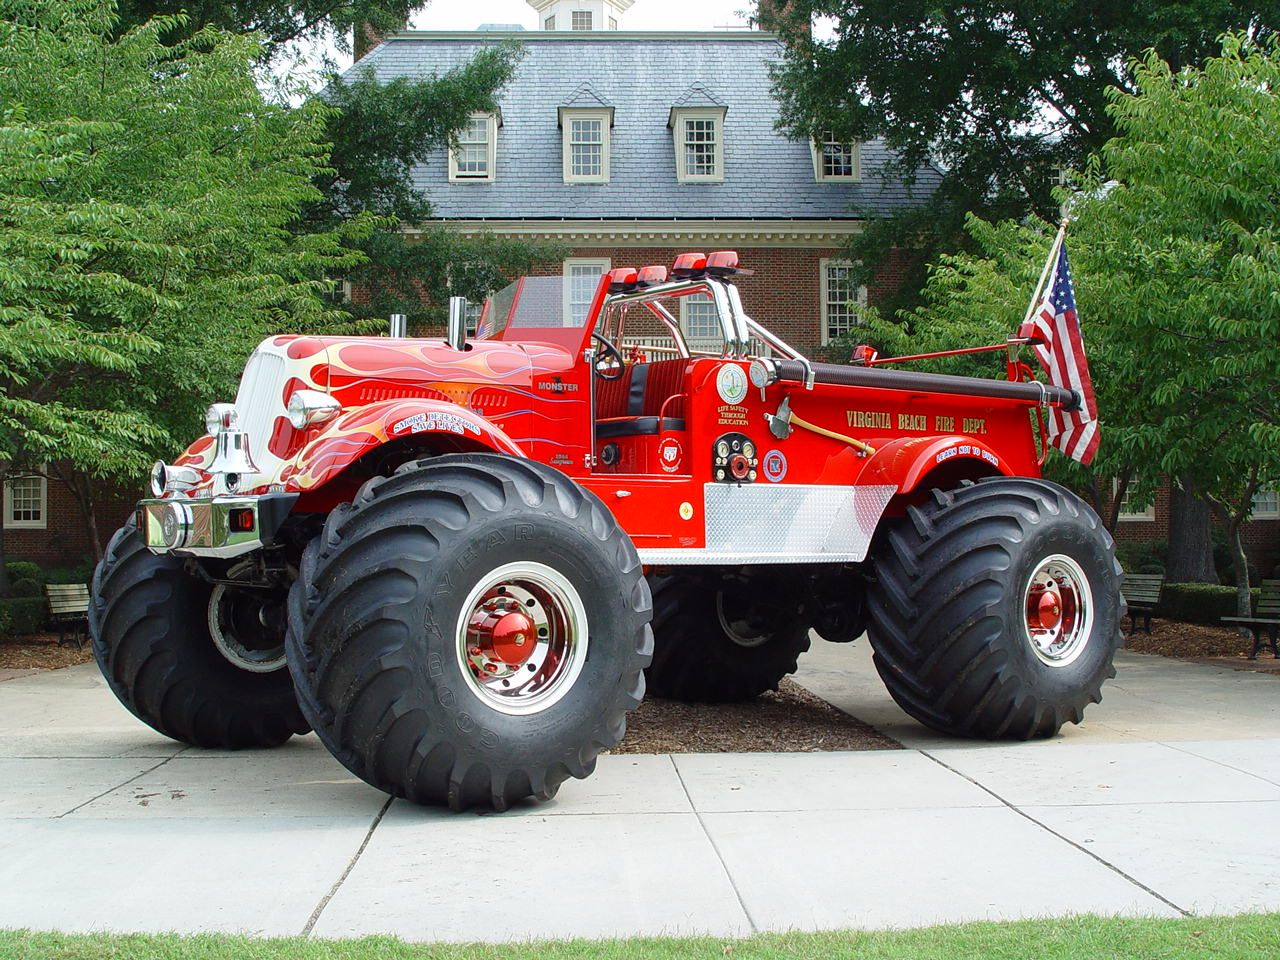 Real Carros Carros De Verdad Monster Trucks Monster Truck Cars Monster Trucks Fire Trucks